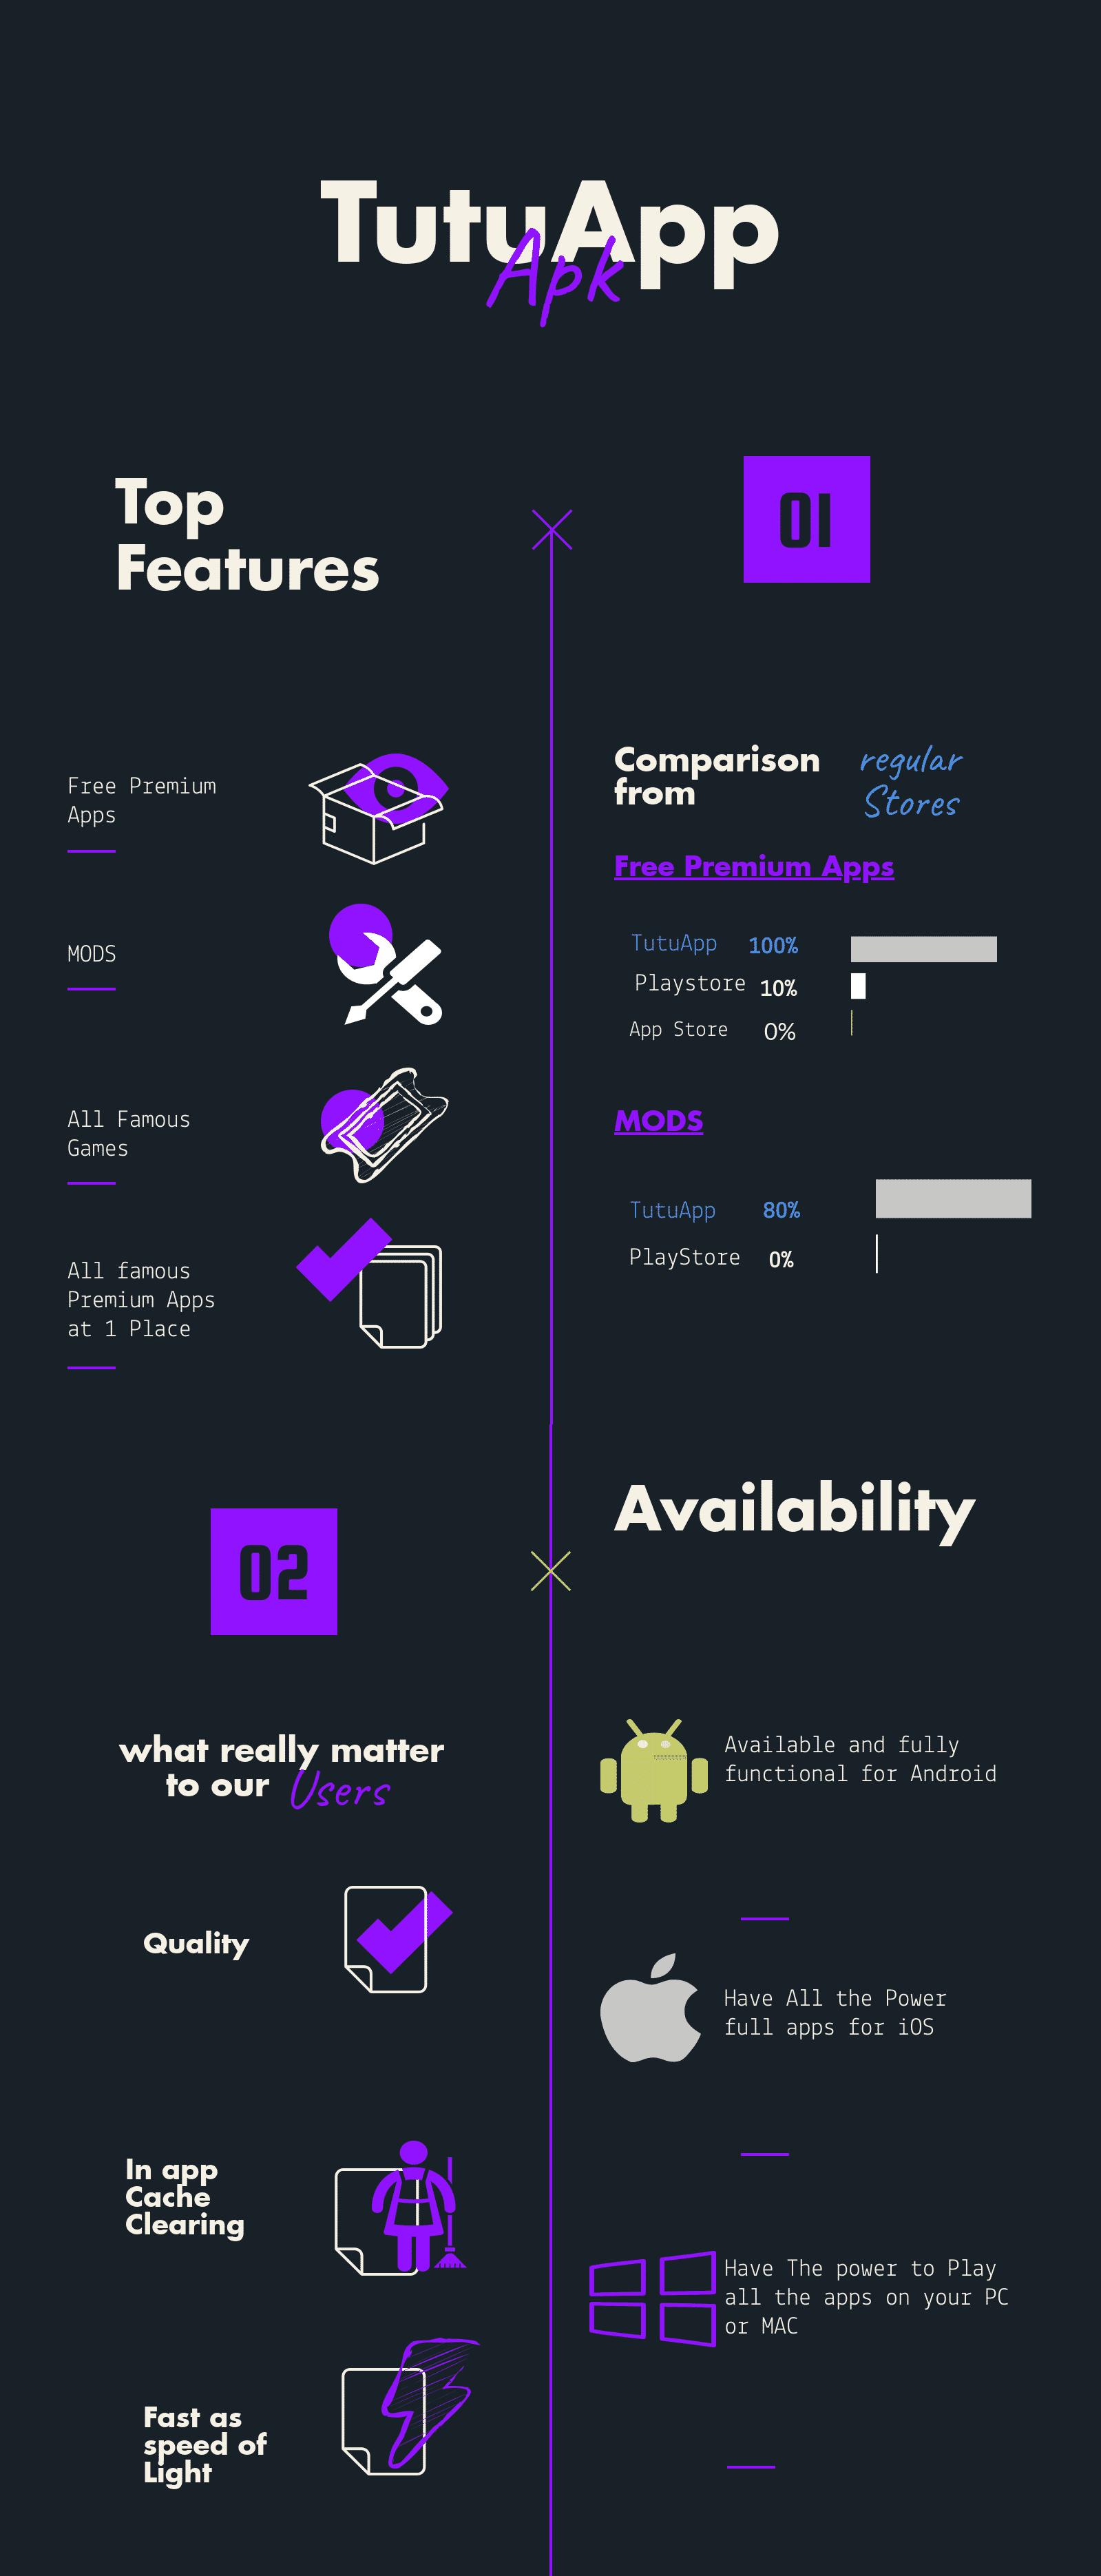 Tutuapp Apk official 2019 [Latest 3 3 7 Version] | Tutu Helper